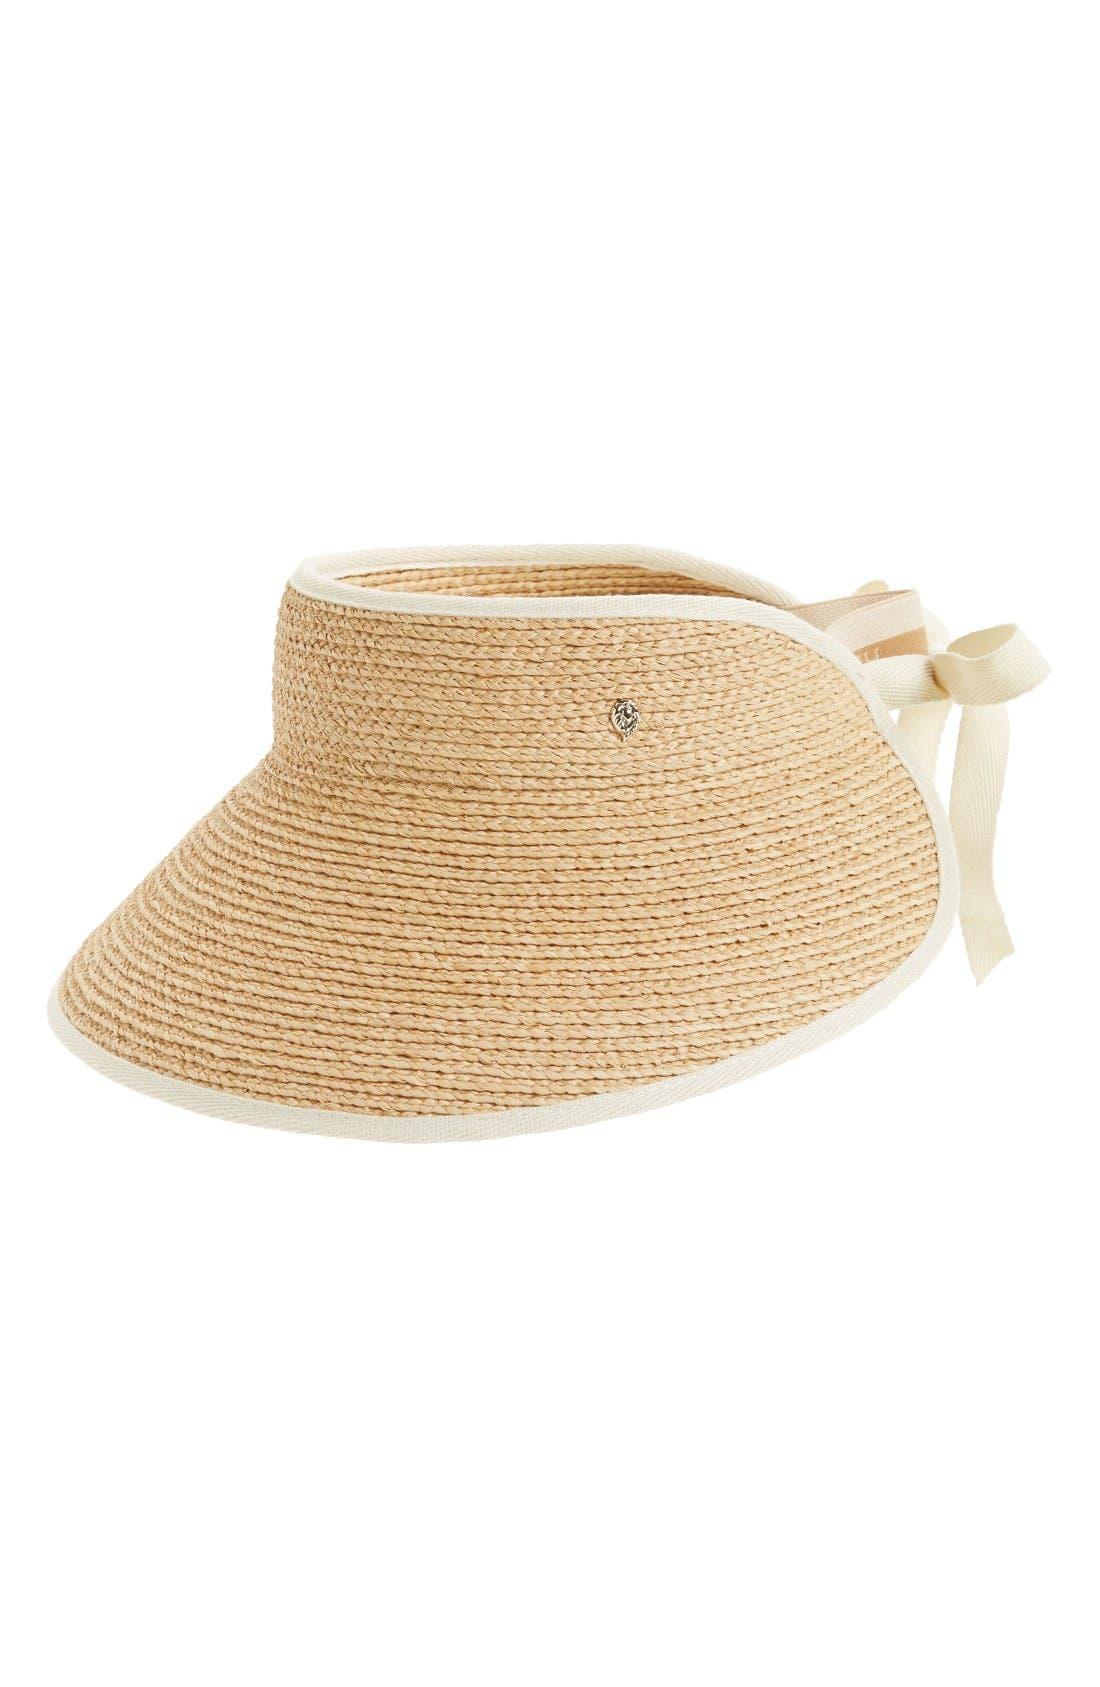 'Mita' Packable Raffia Visor,                         Main,                         color, Natural Sand